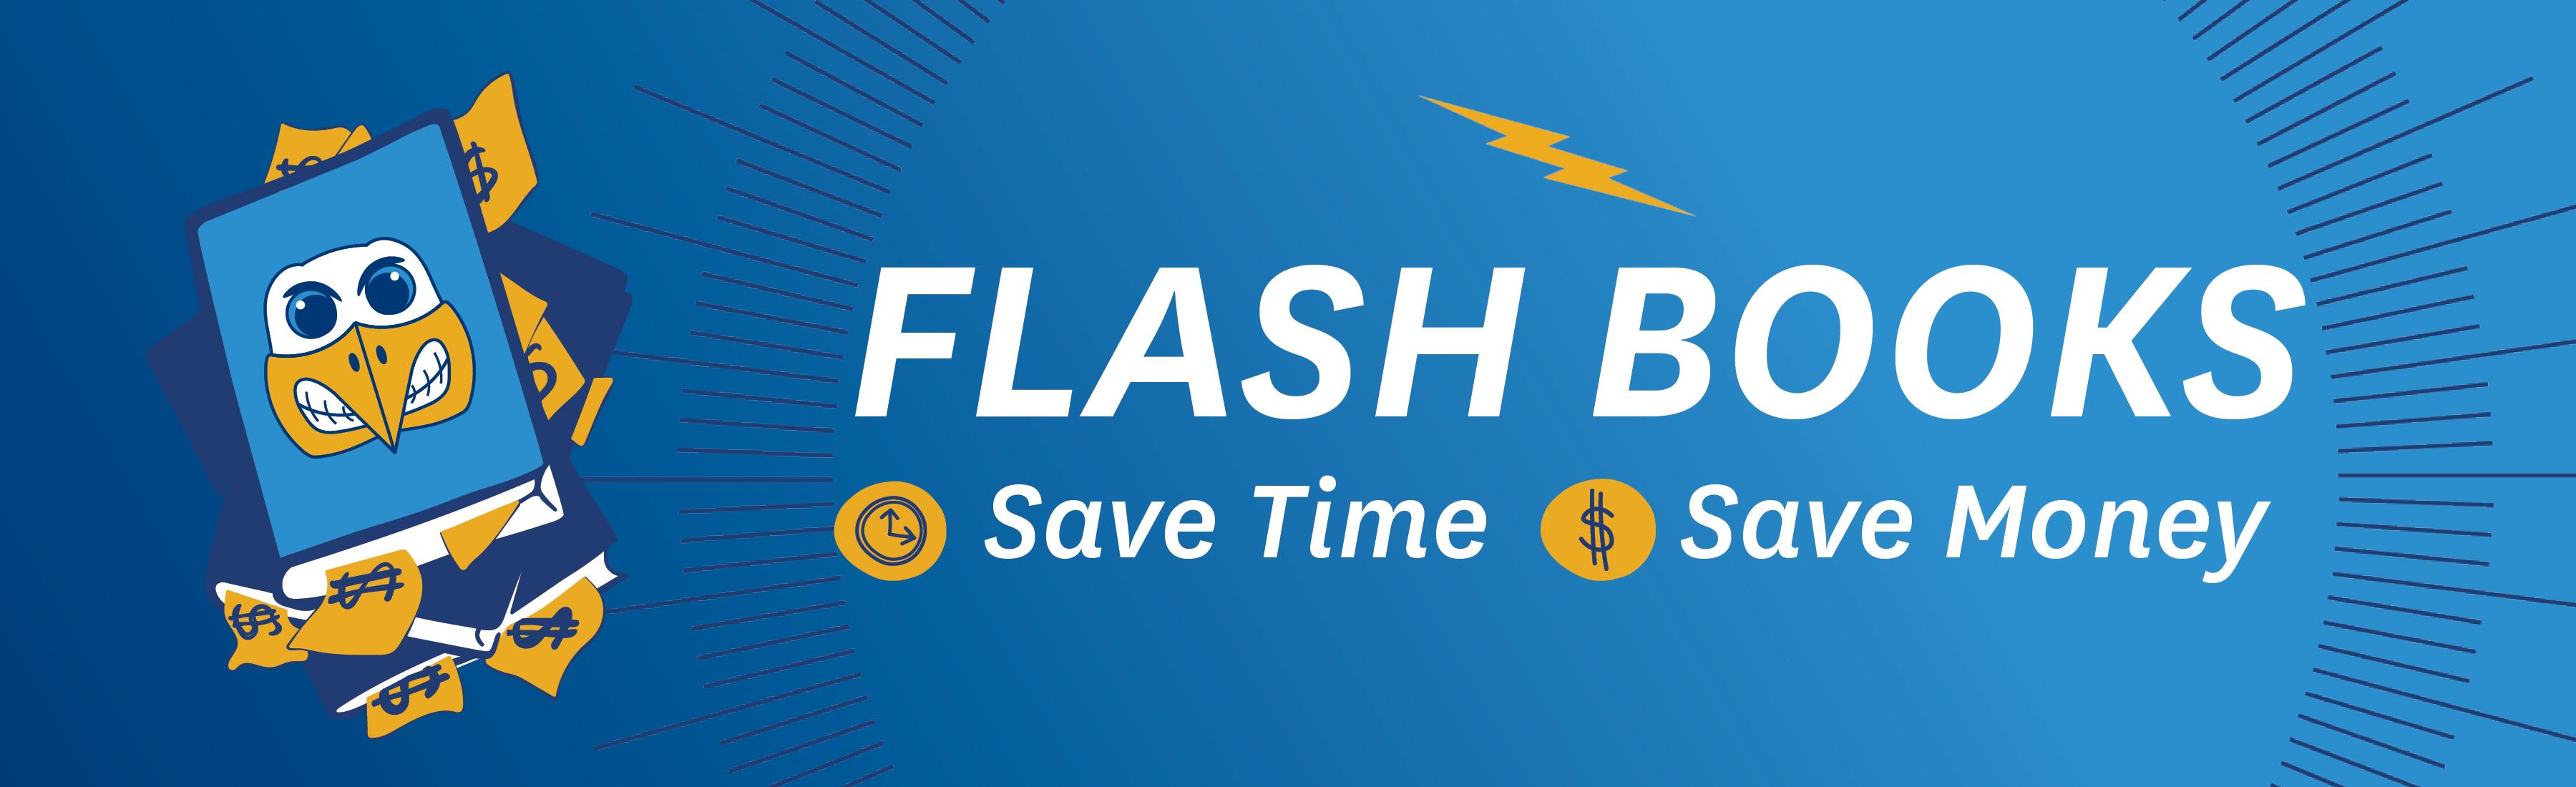 Flash Books Save Time Save Money